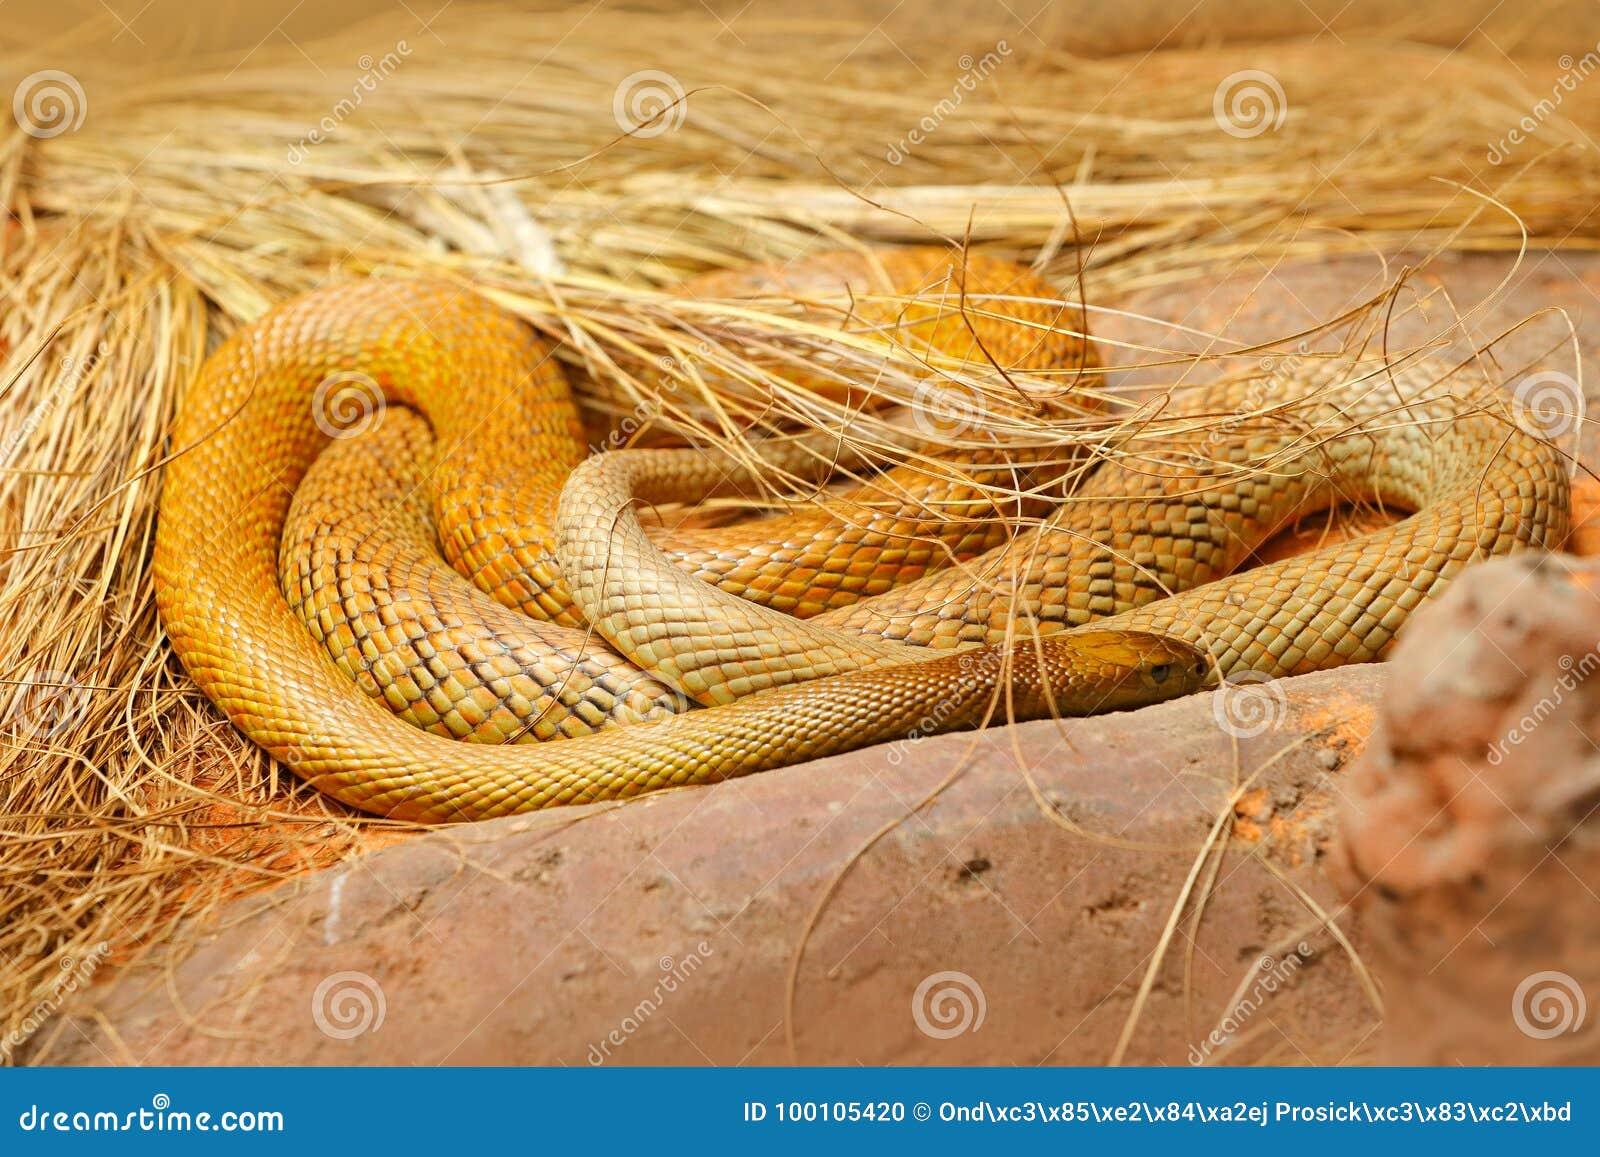 Inlands- taipan, Oxyuranusmicrolepidotus, Australien, mest giftig orm Giftorm i gräset Faradjur från Australien